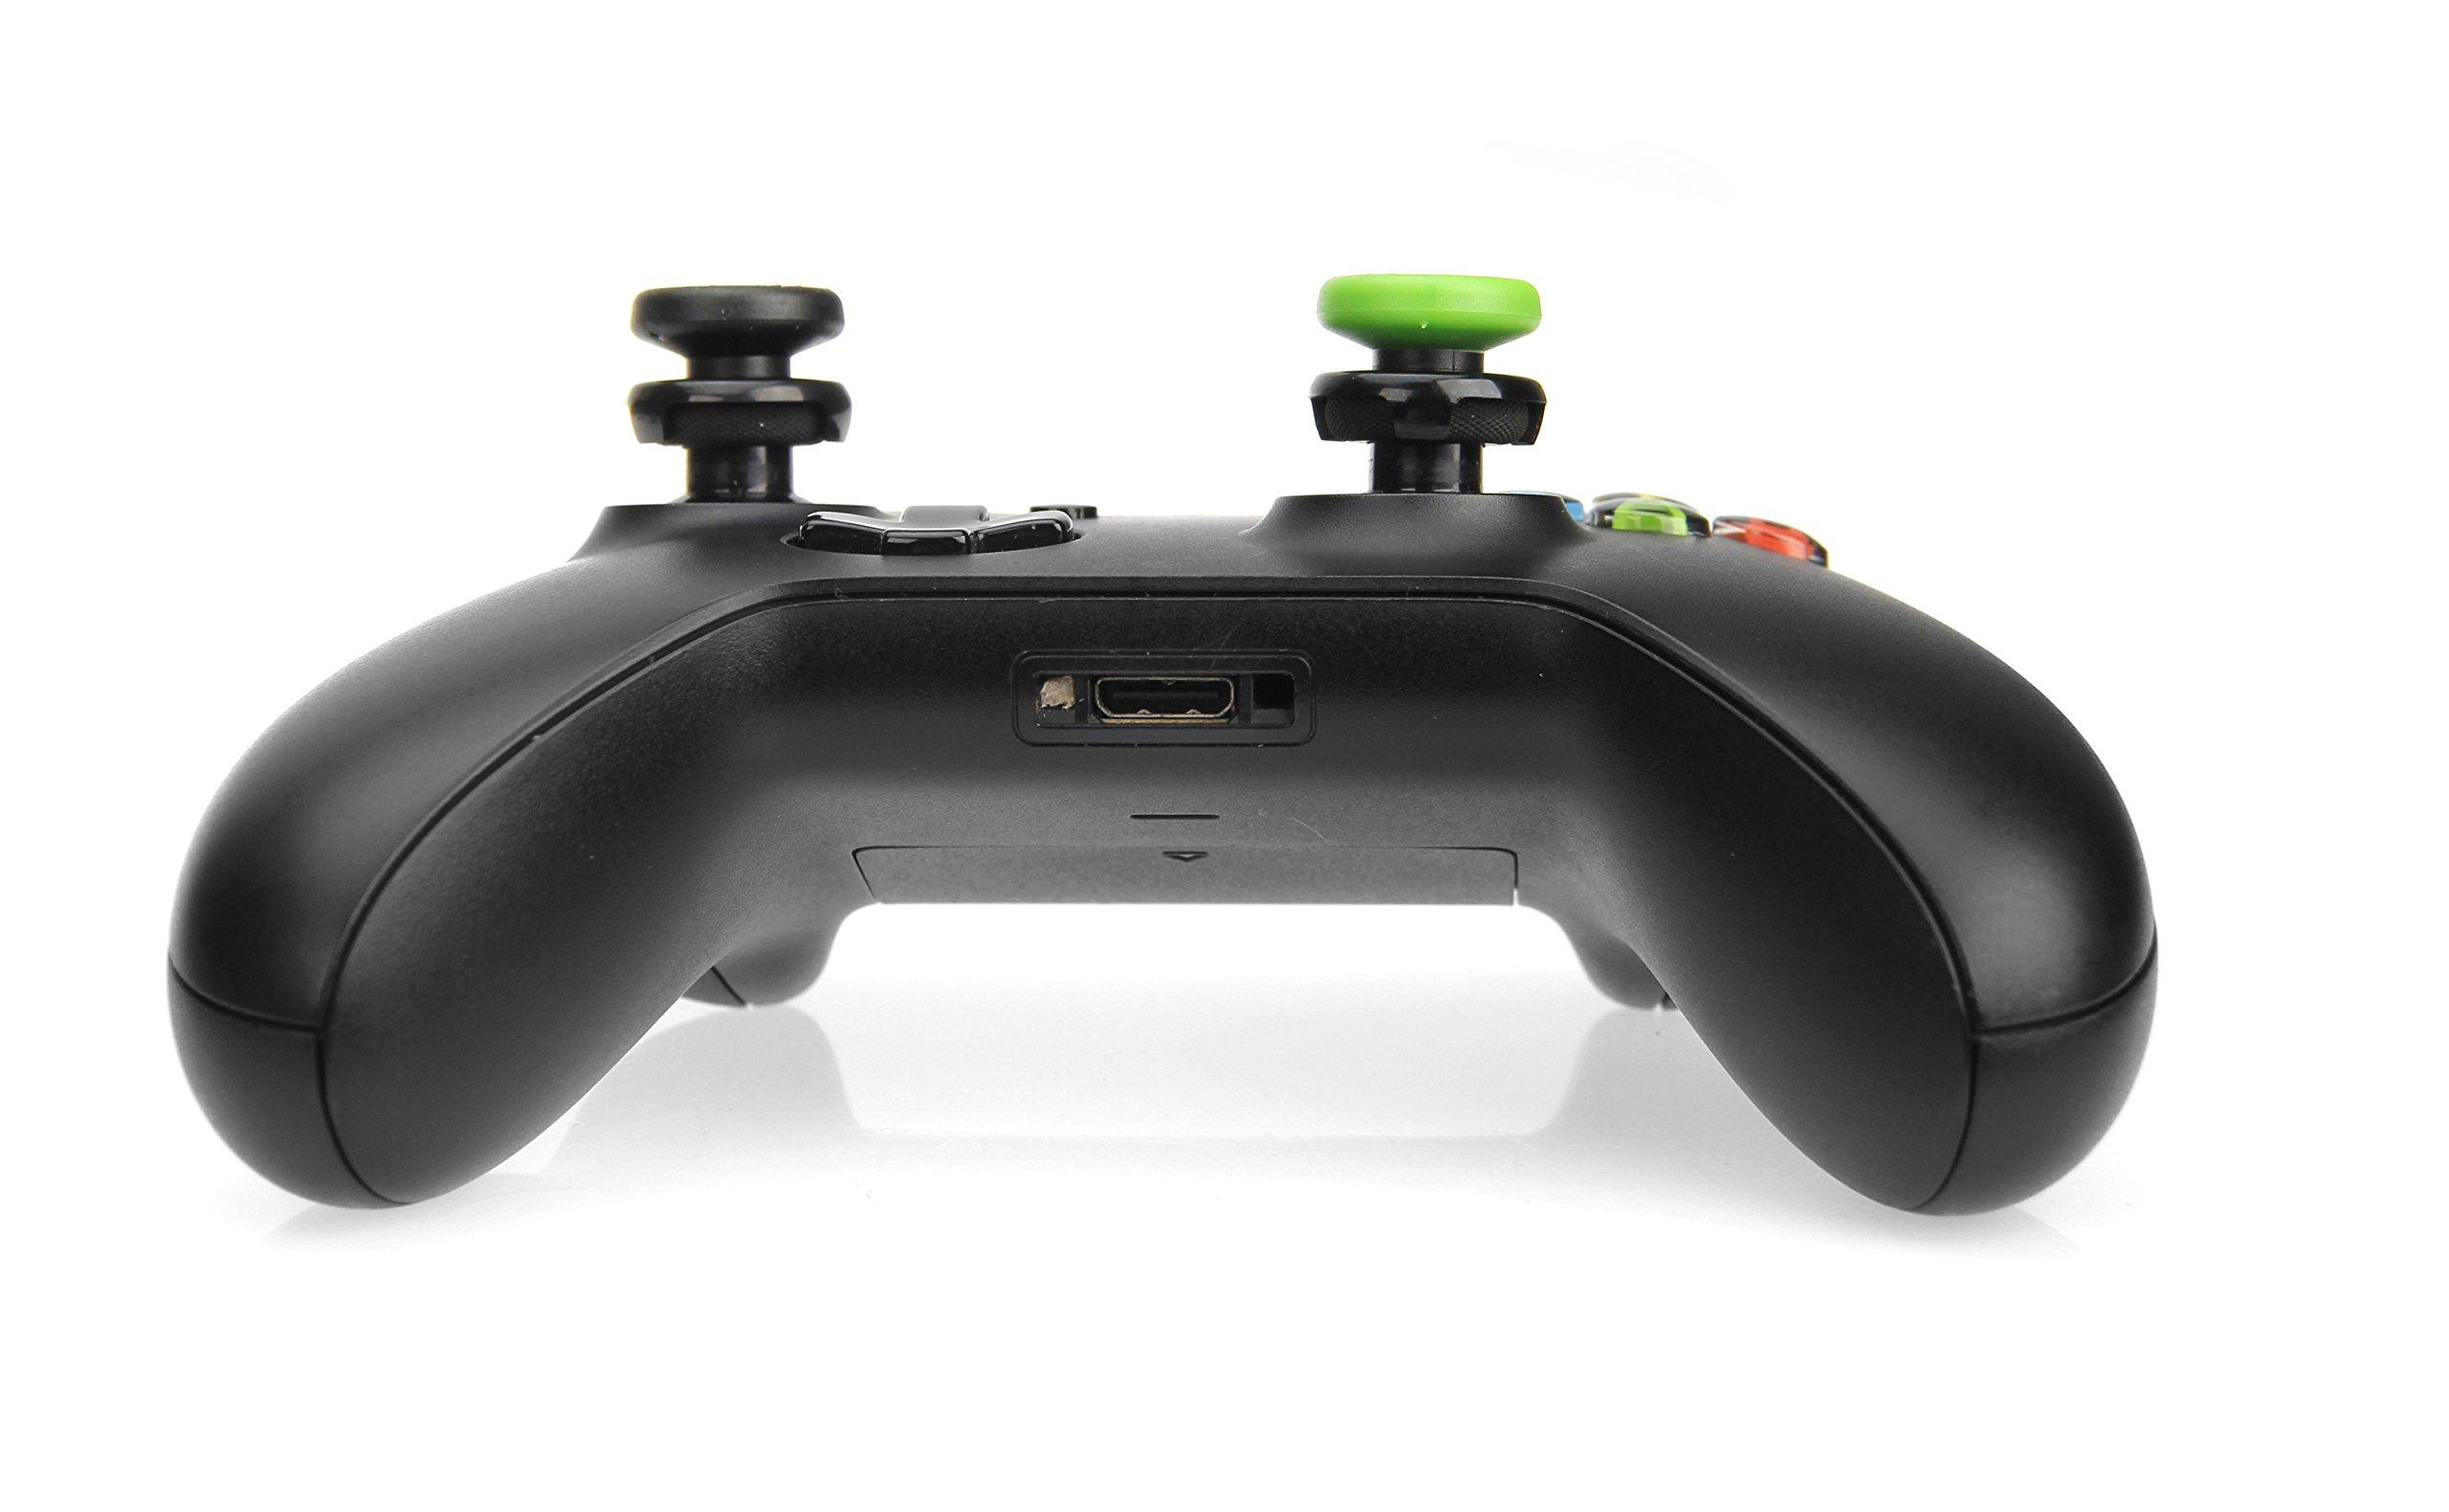 AmazonBasics Xbox One Controller Thumb Grips - 4-Pack, Black and Green by AmazonBasics (Image #4)